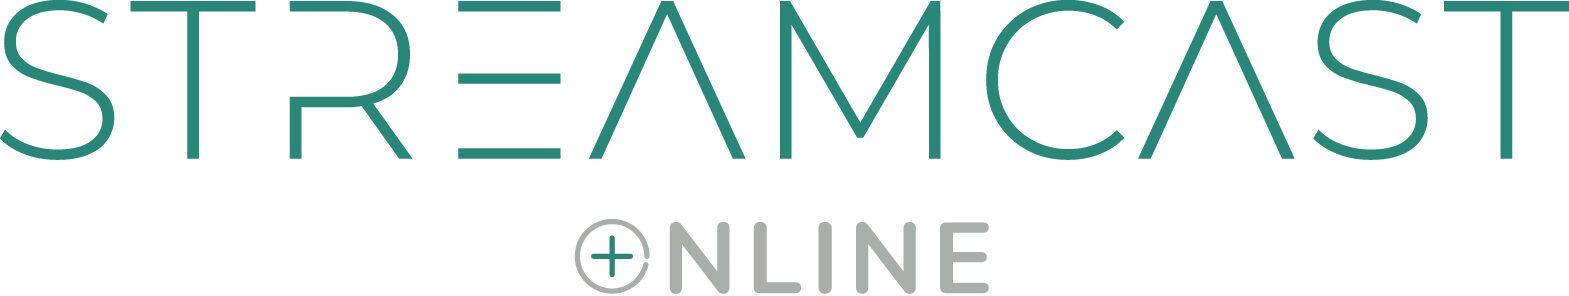 Streamcast Online Inc.